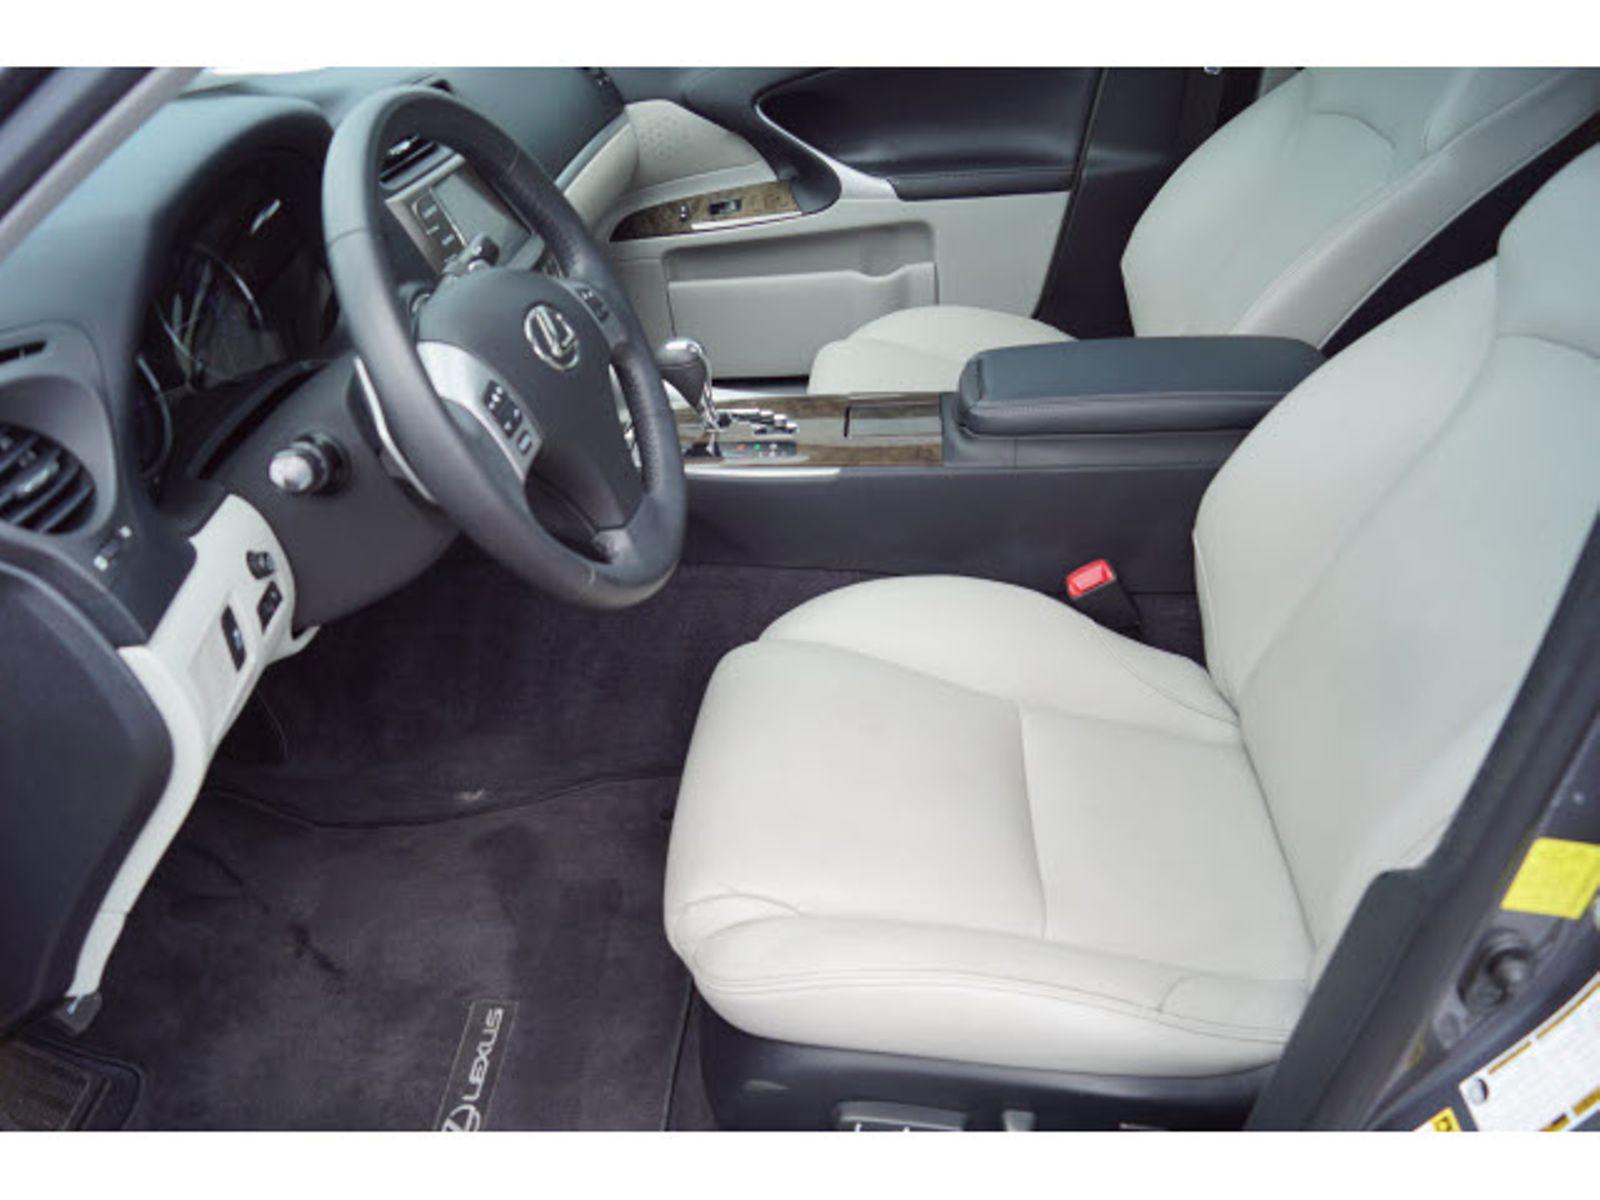 2012 Lexus IS 250 Base city Texas Vista Cars and Trucks